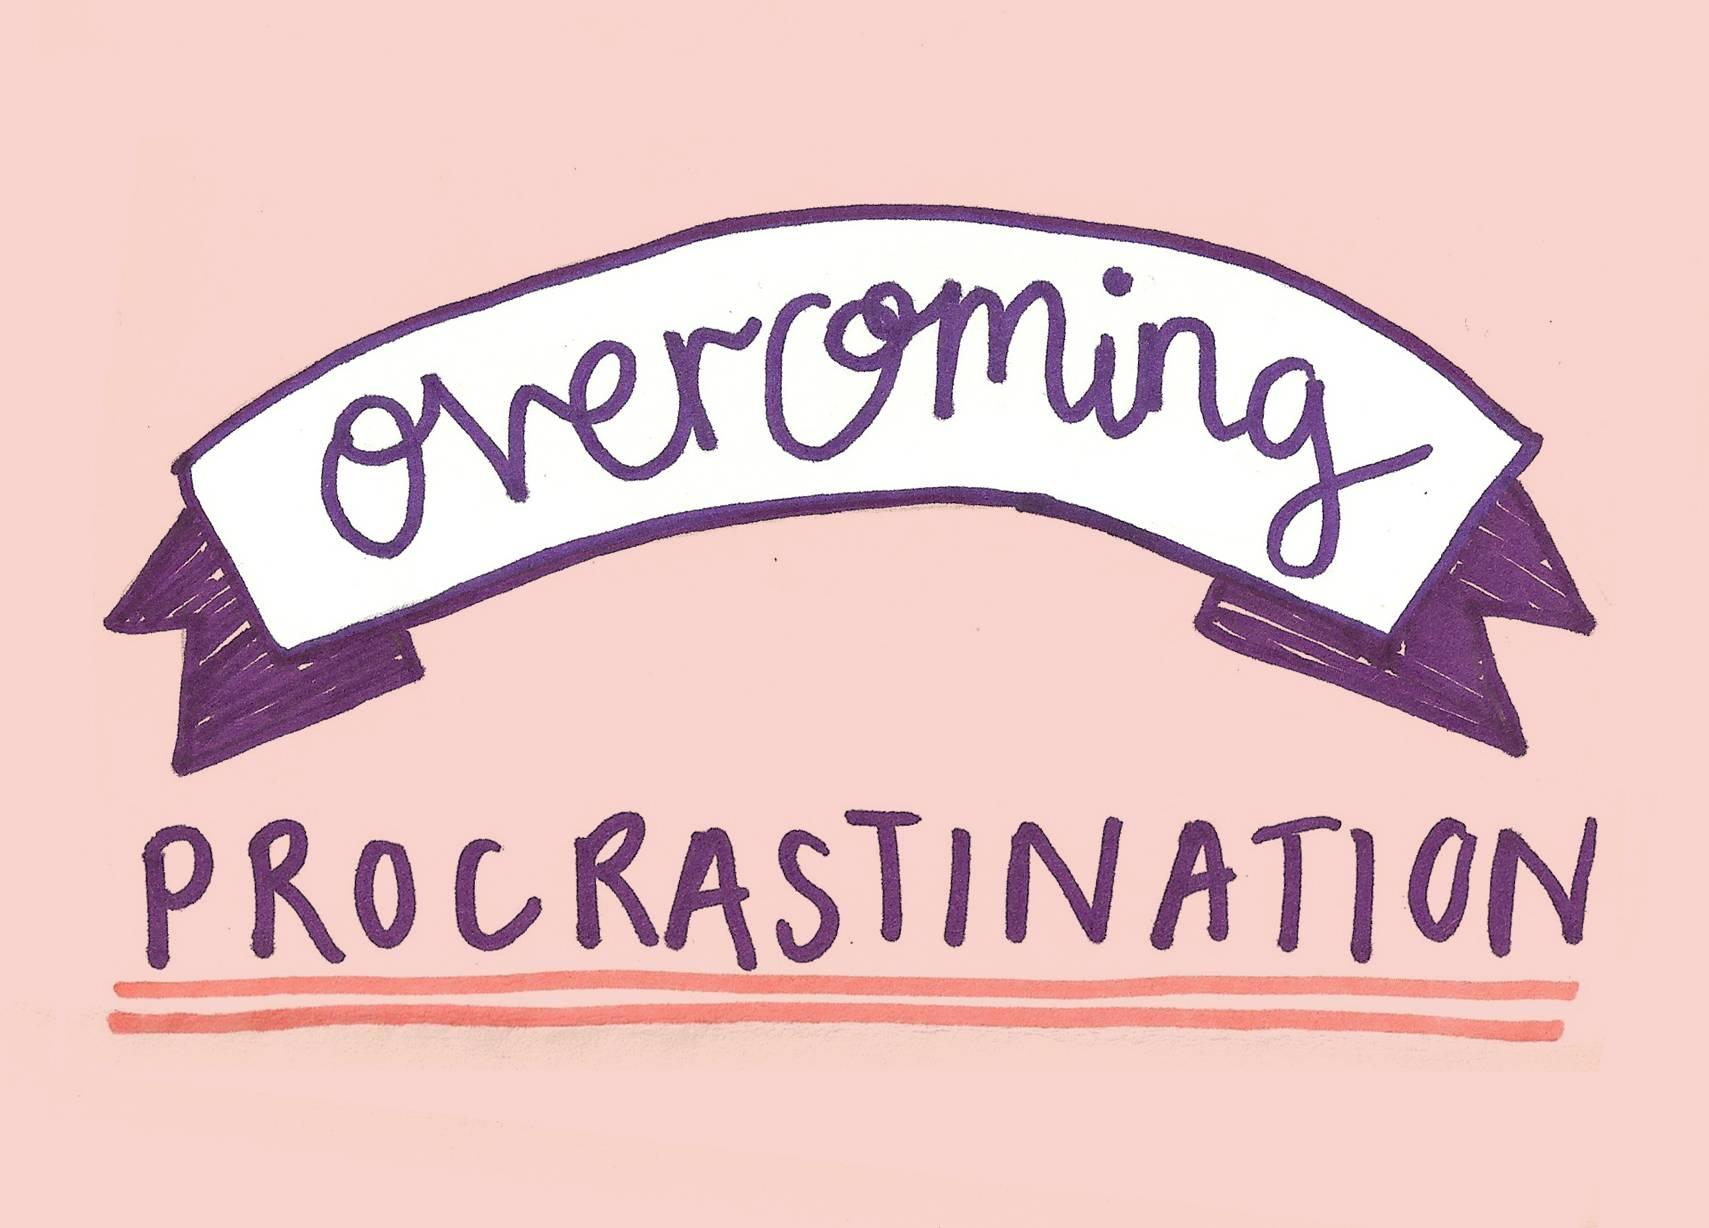 https://graphiquefantastique.com/wp-content/uploads/2016/10/OvercomingProcrastination1.jpg